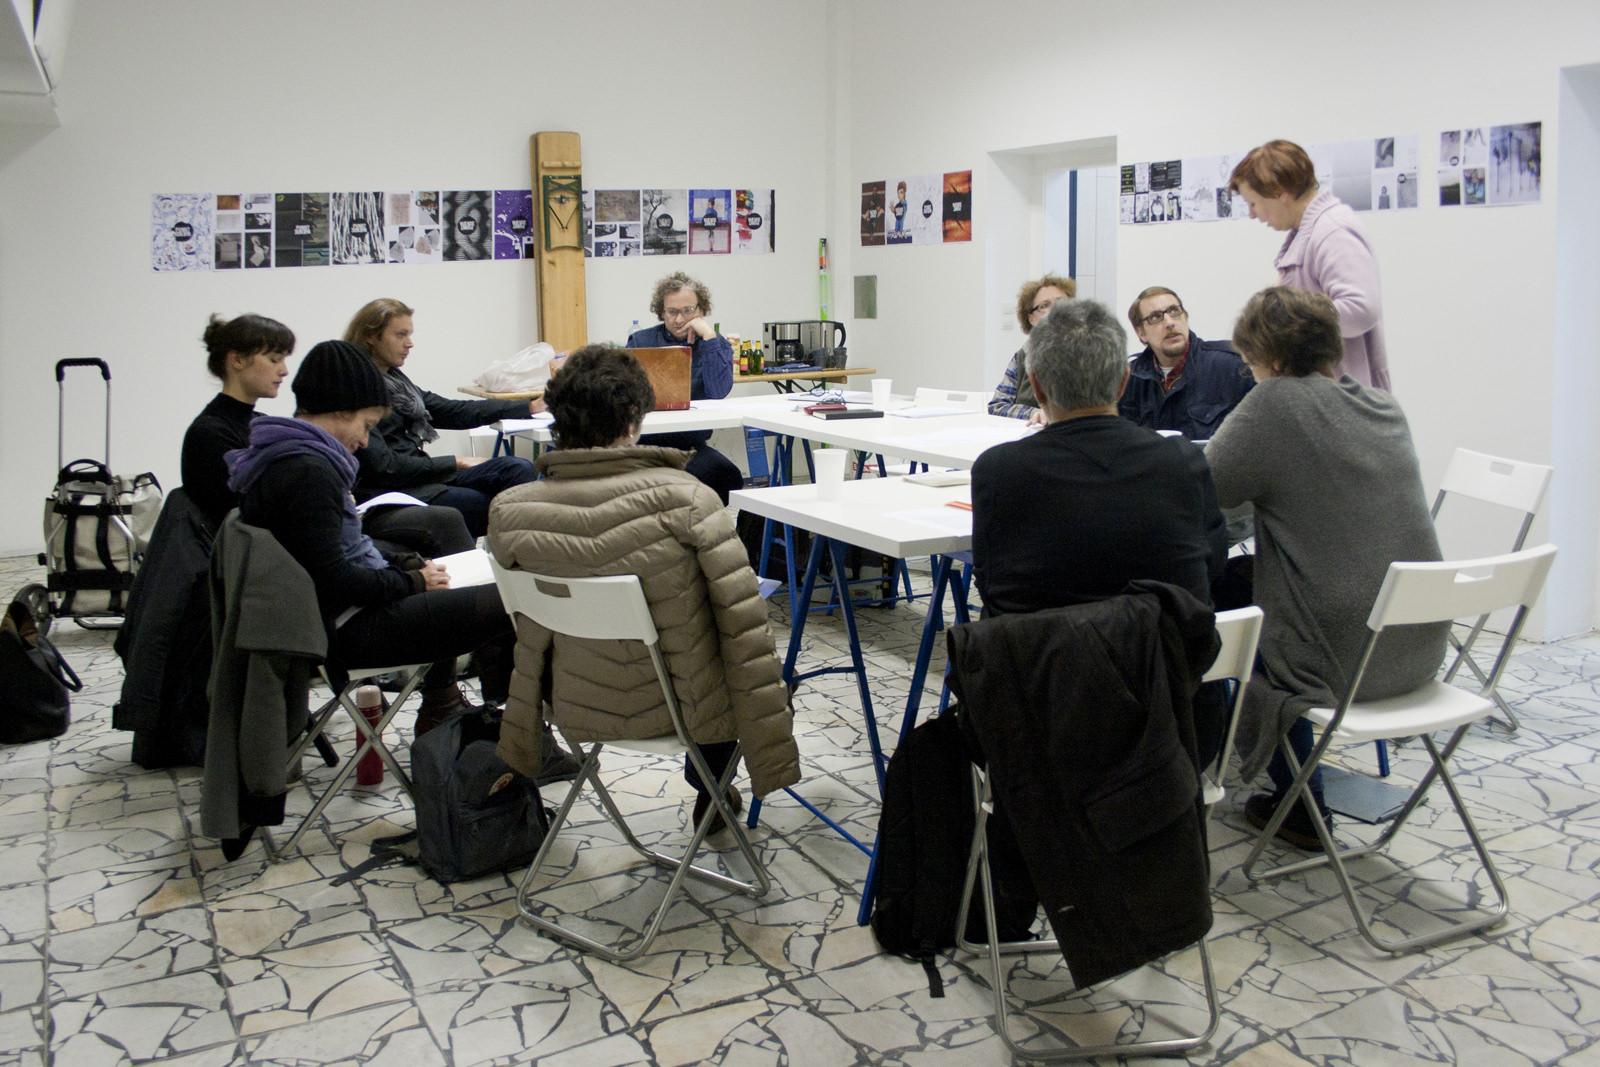 Konferenz kunstschule.wien am 28. Oktober 2015 in der Denkwerkstatt am Rosenacker